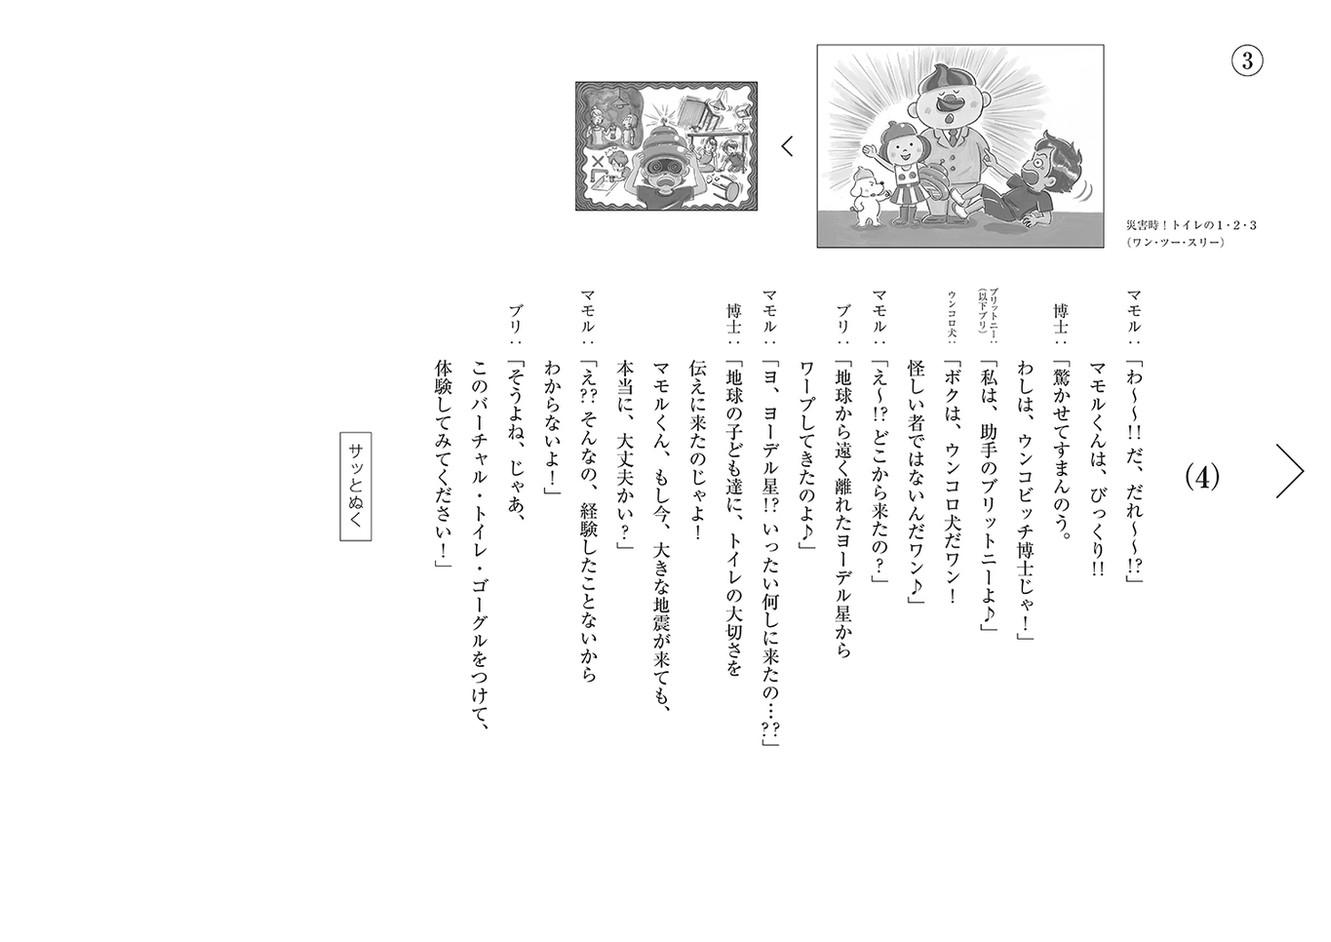 kanaweb_toiletkamishibai_008.jpg